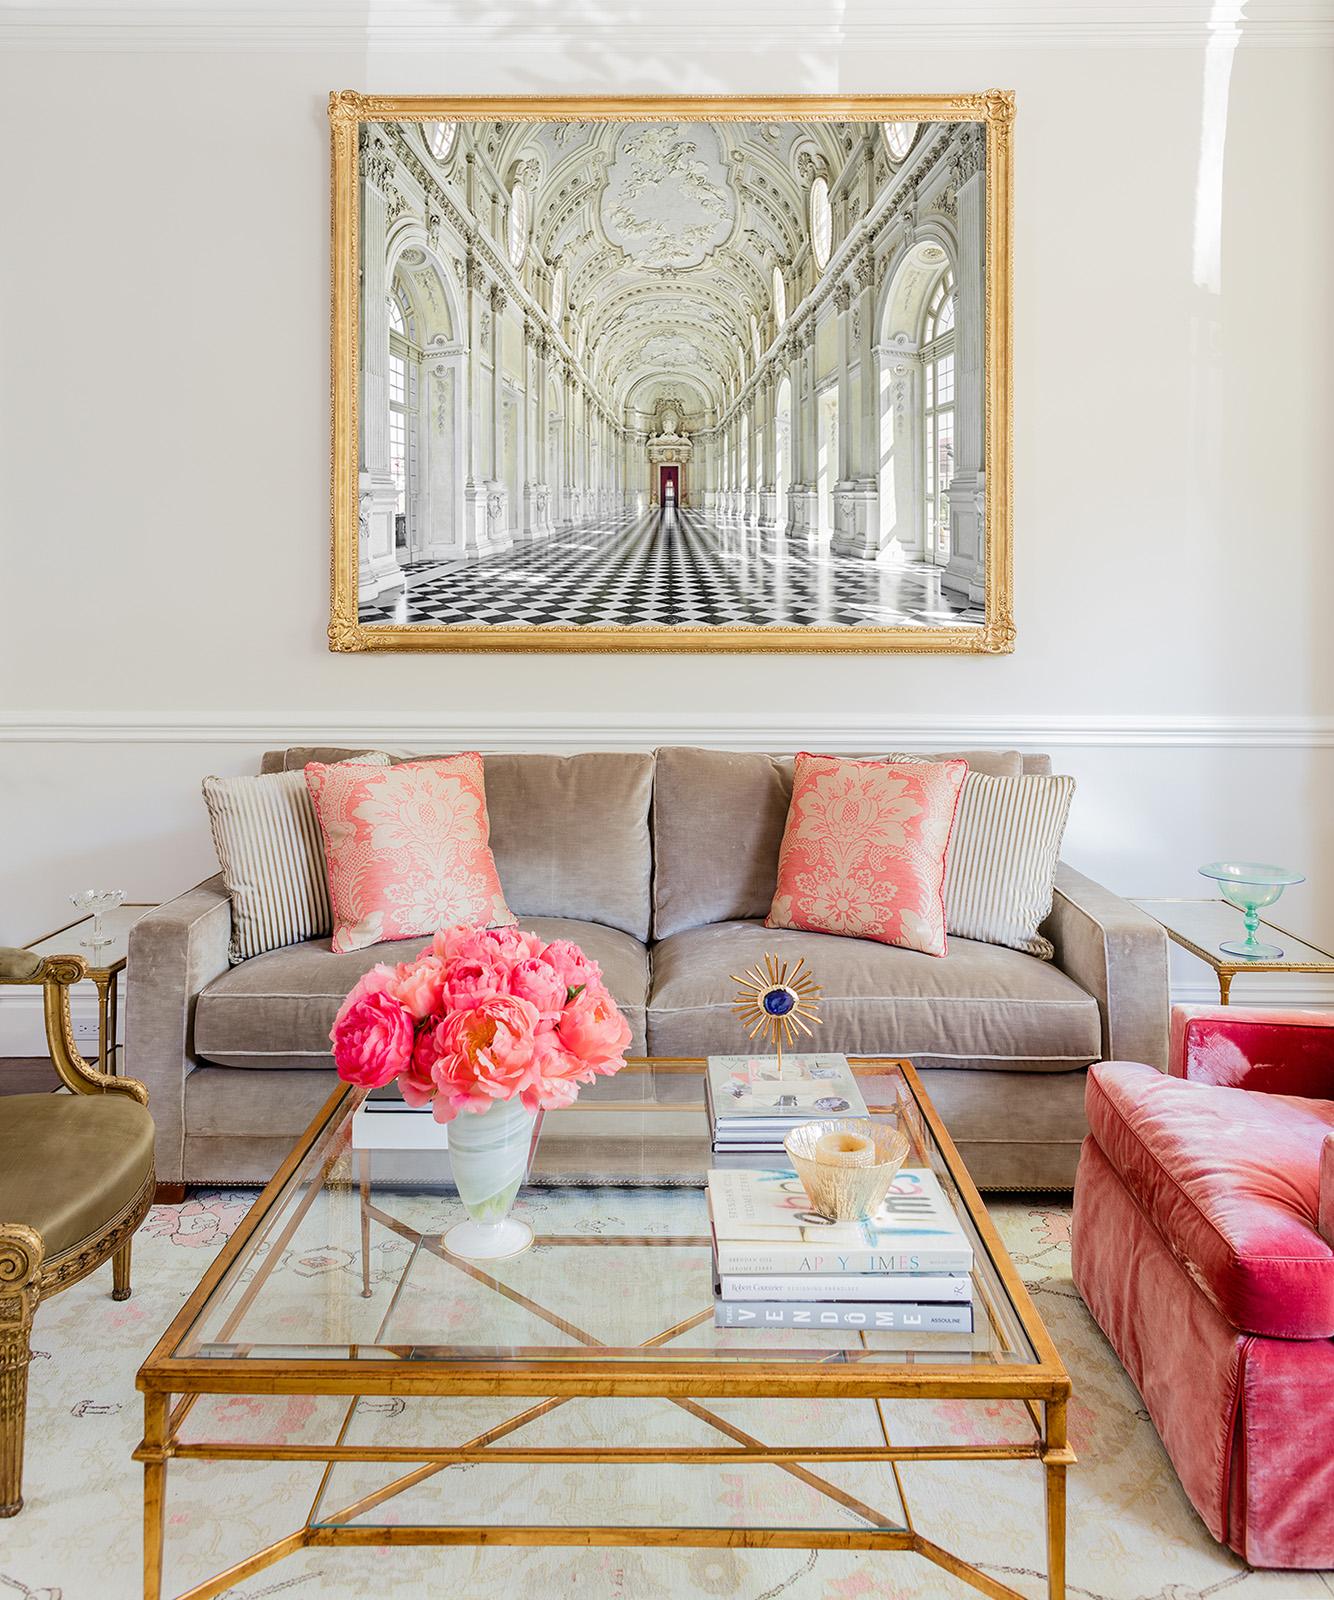 David Burdeny   - Reggia di Venaria Reale, Torino, Italy   Interior: Kristine Mullaney Design, LLC  Photo: Michael J. Lee